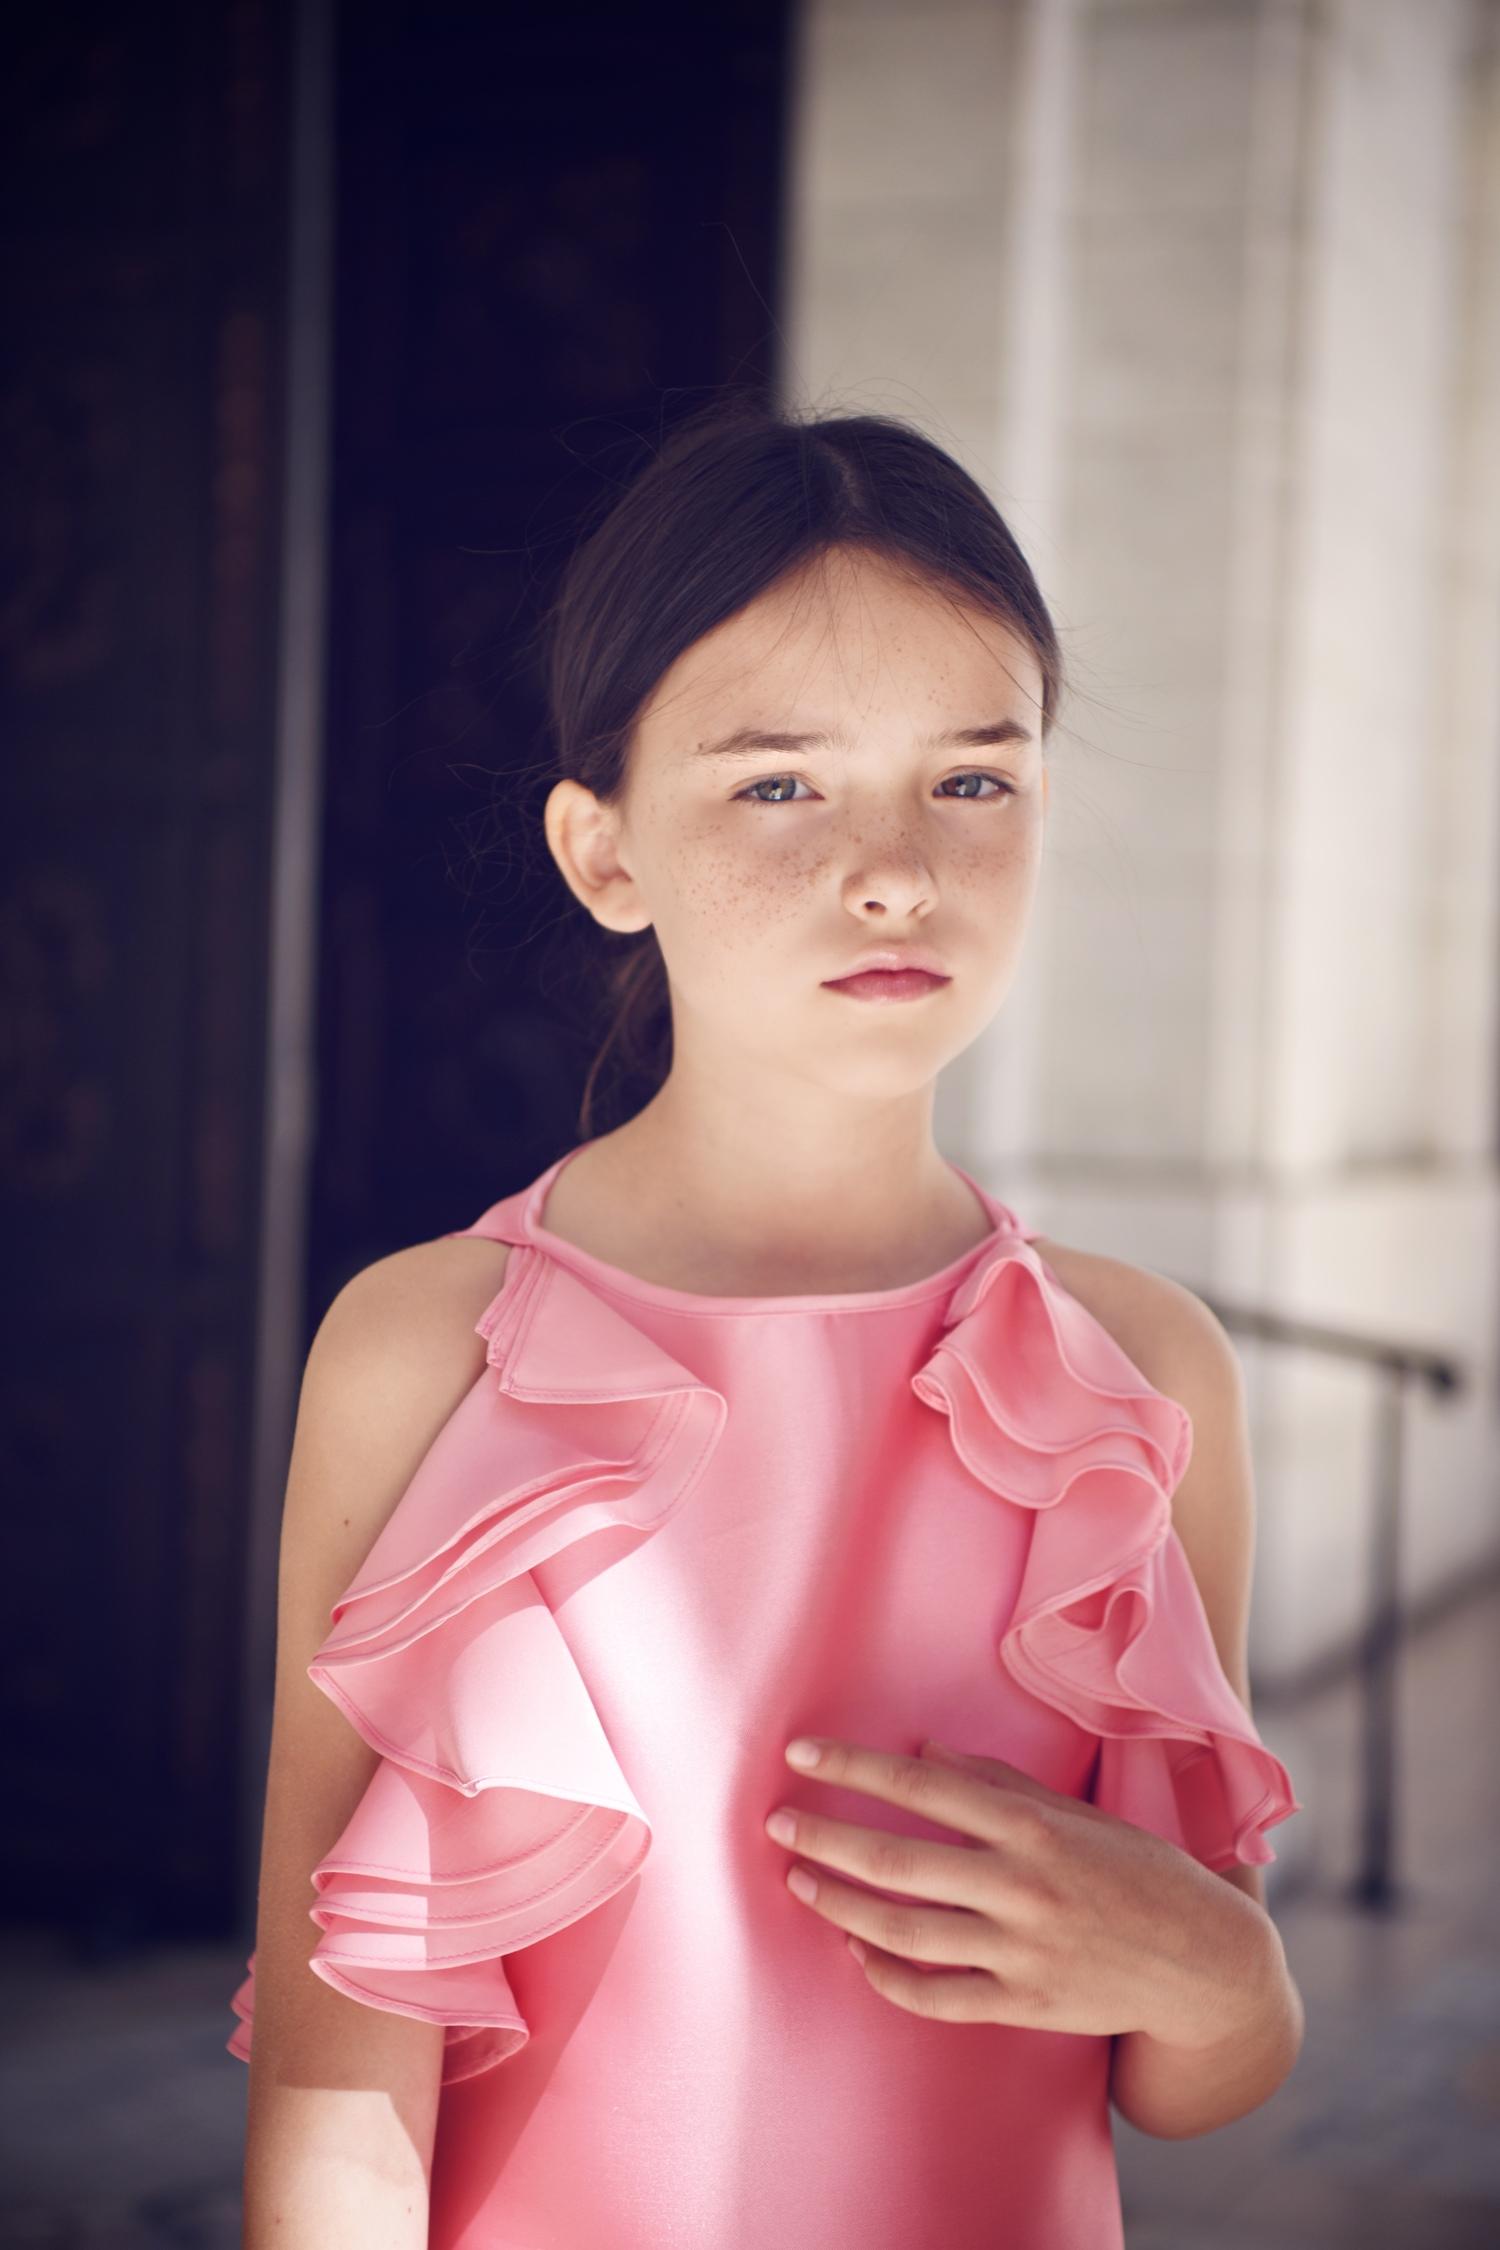 Enfant+Street+Style+by+Gina+Kim+Photography-11.jpeg